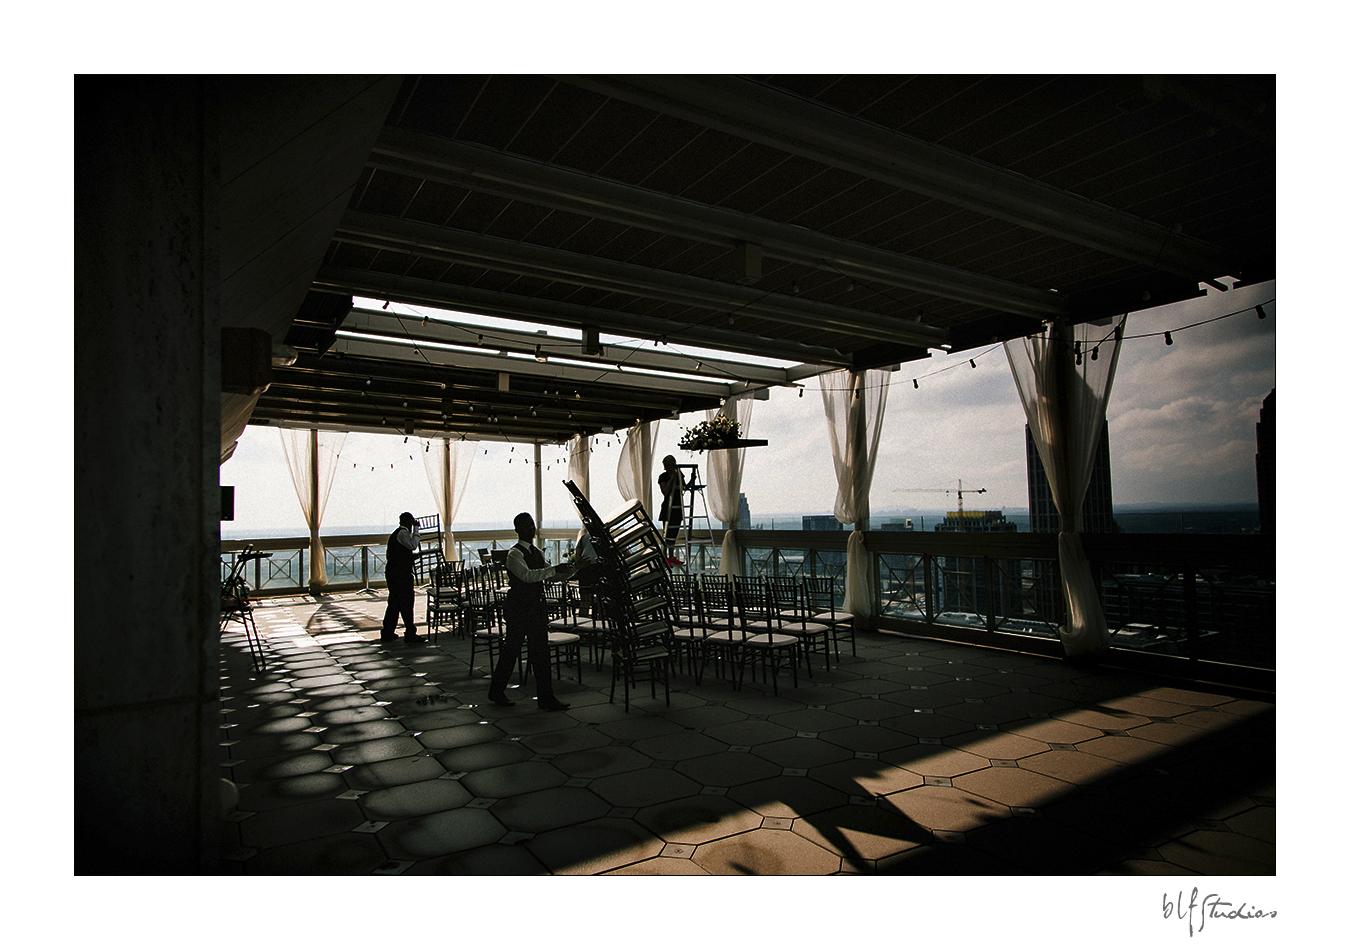 0002-blfstudios-wedding-photographer-daniel-danielle-atlanta.jpg